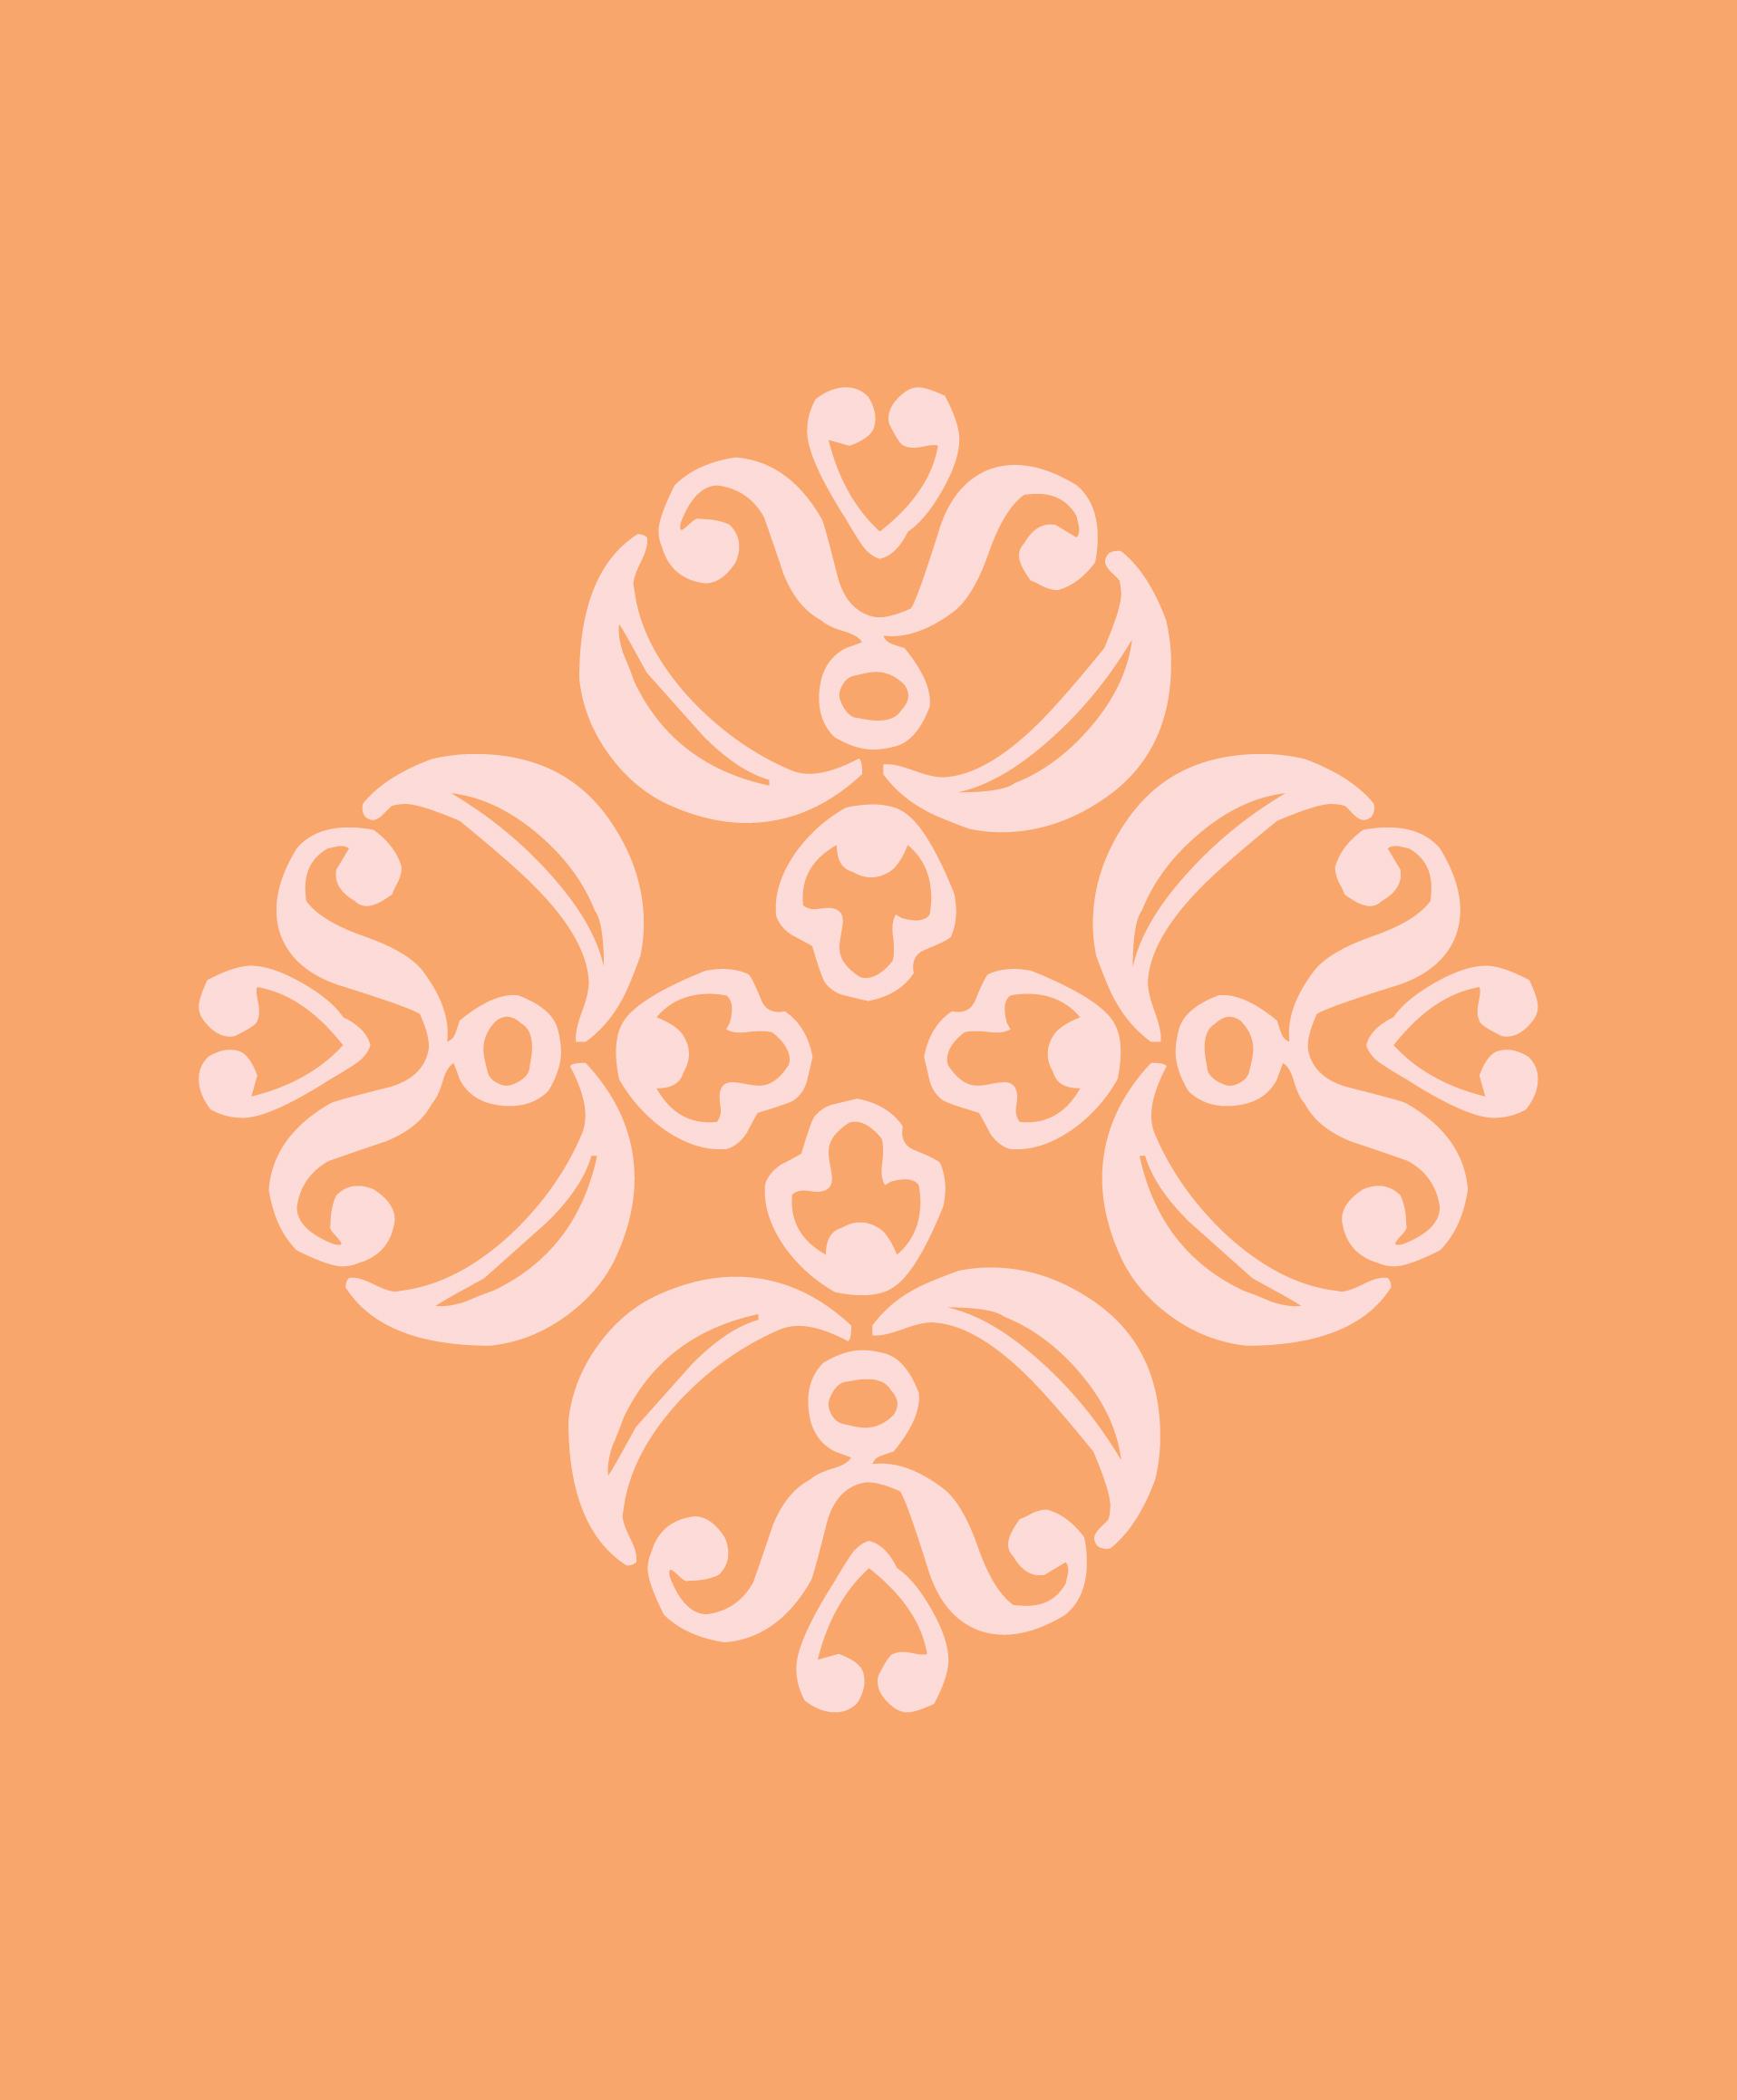 Duplicated Symbol